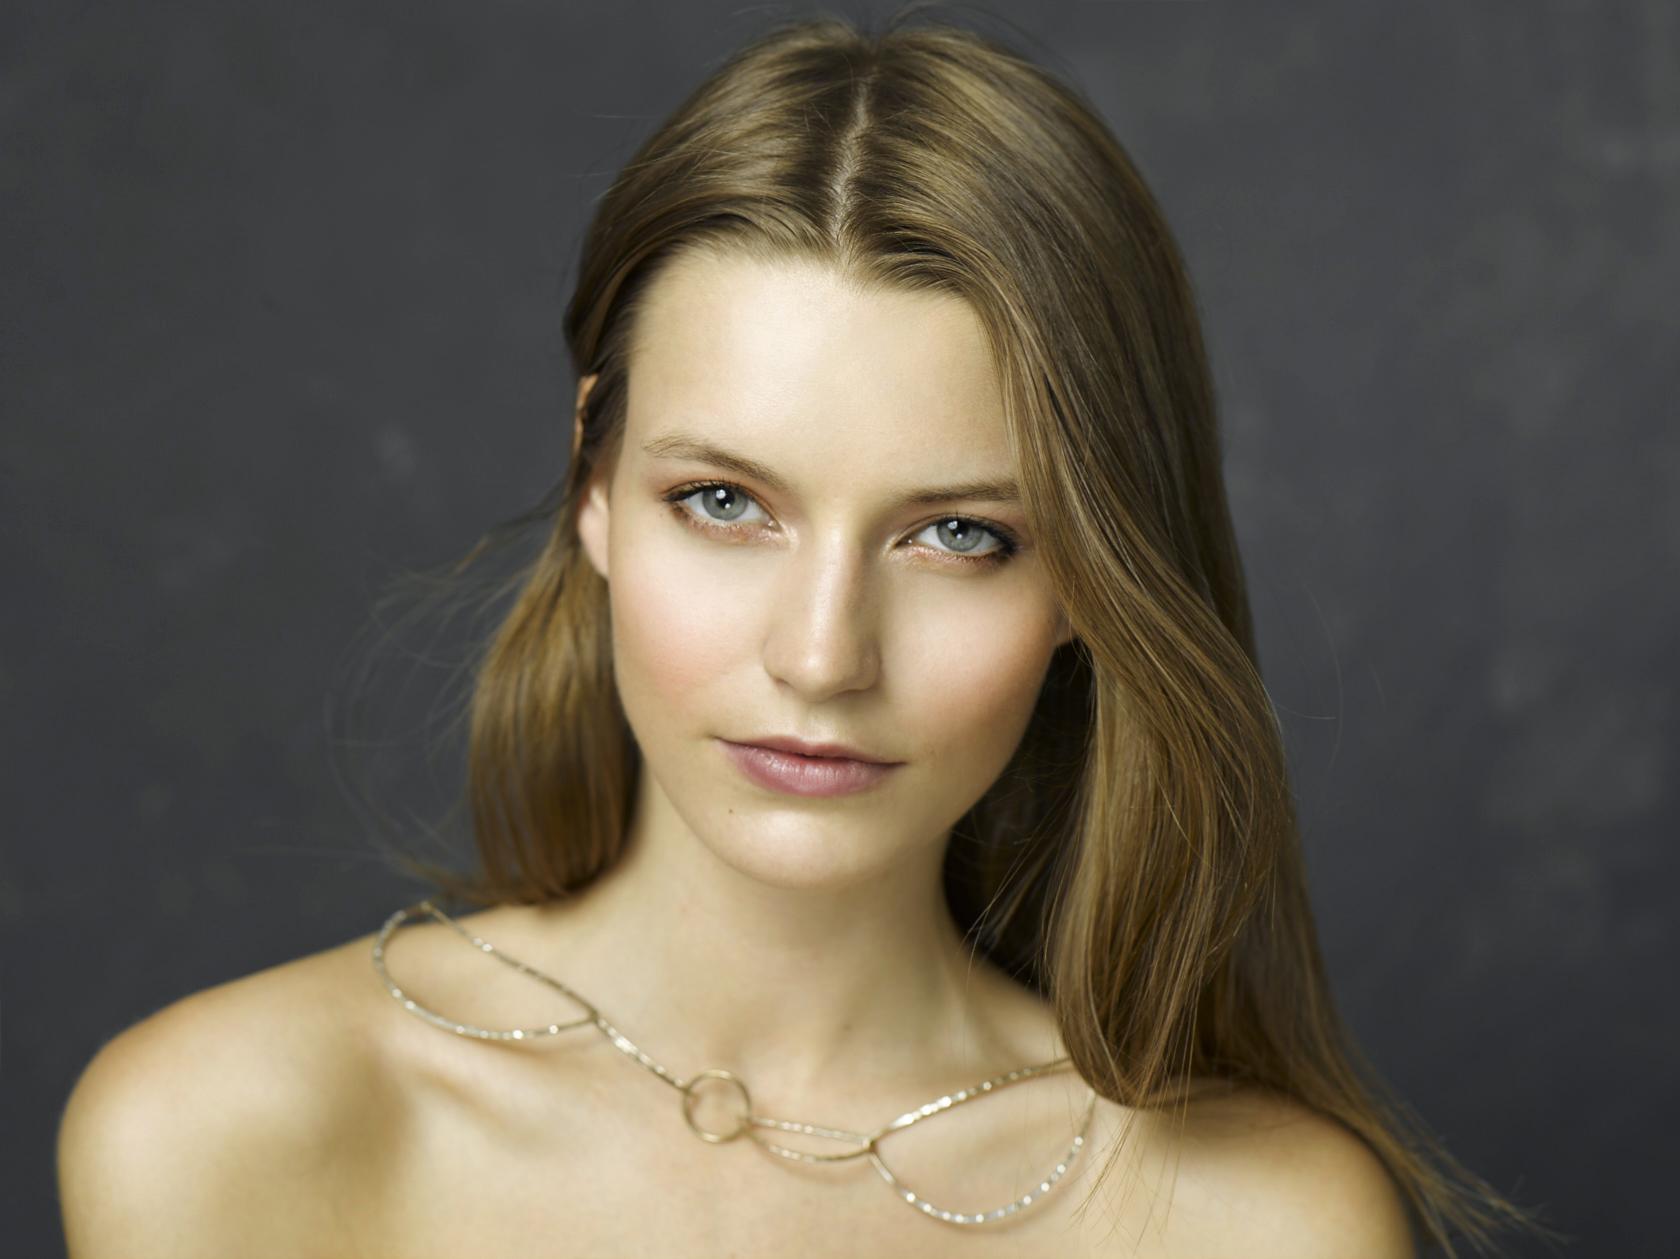 Модели портрет фото